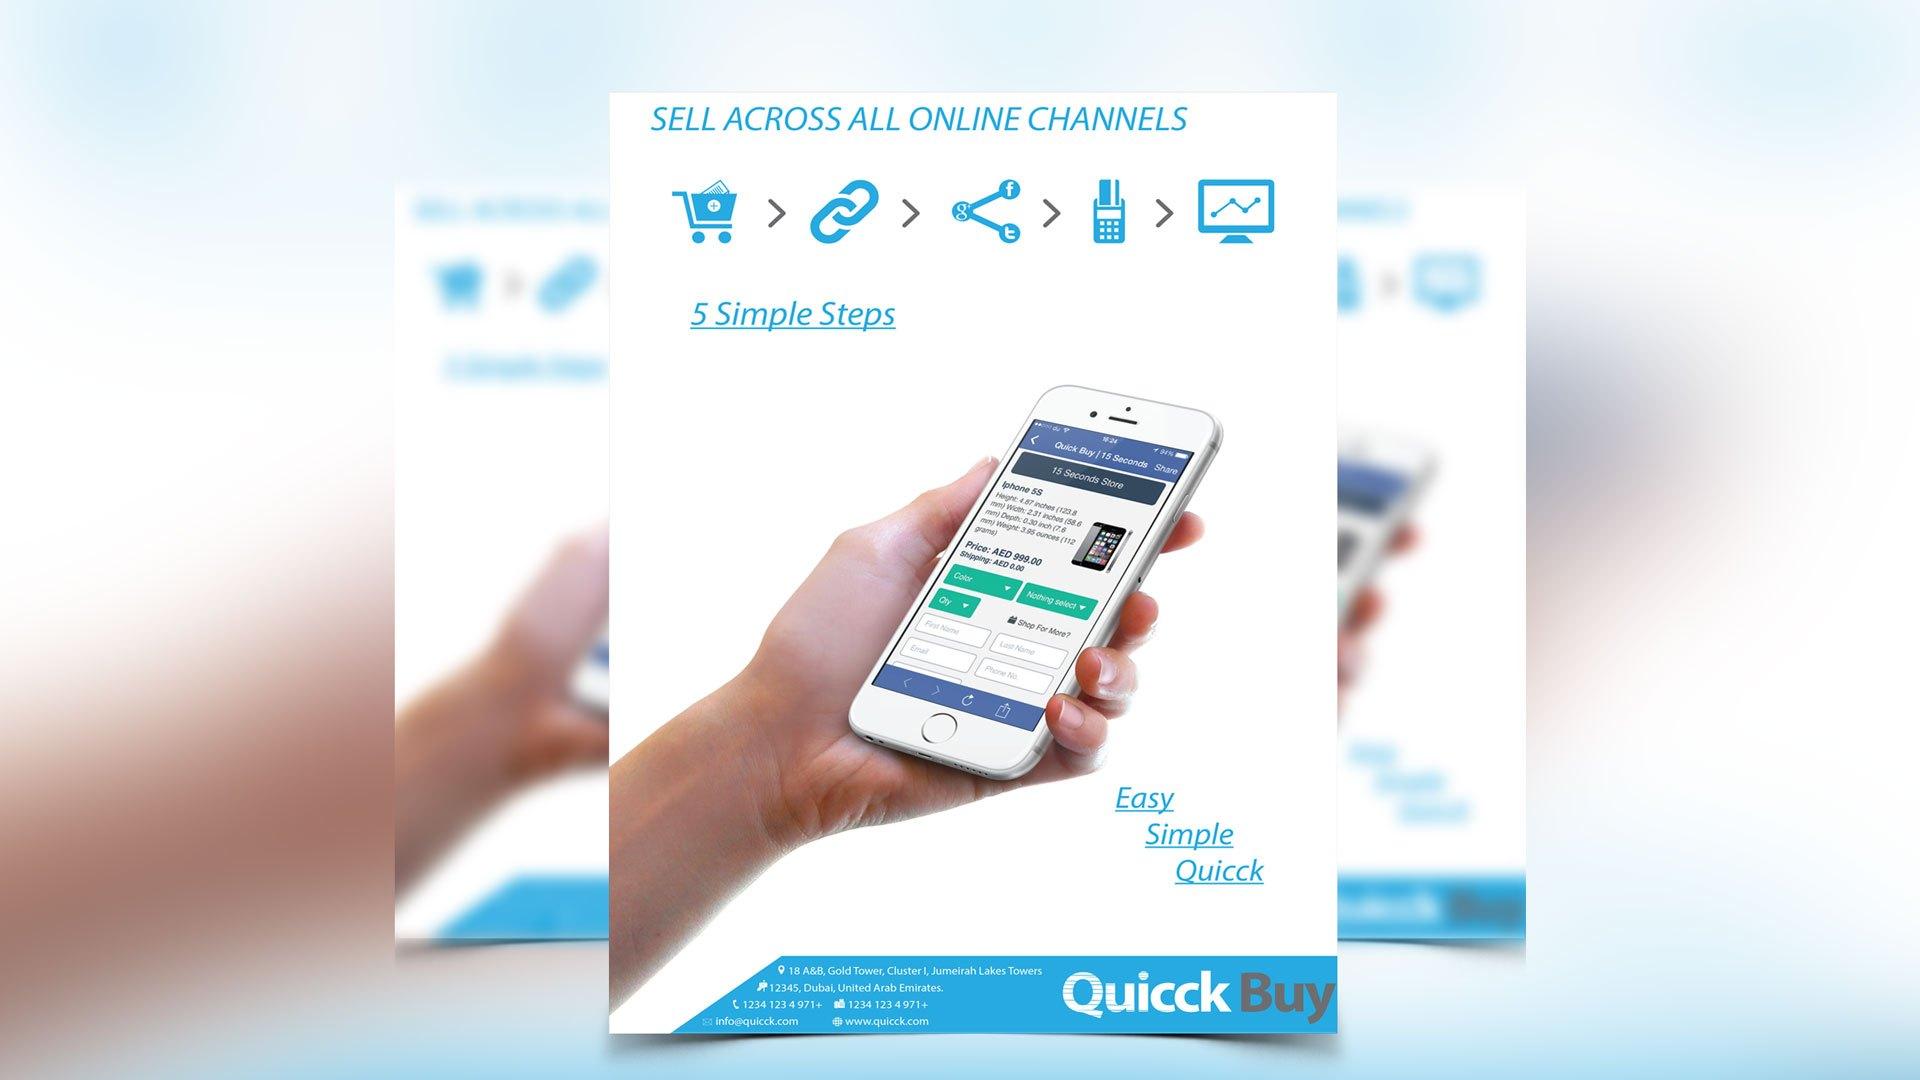 Quicckbuy-flyer-design